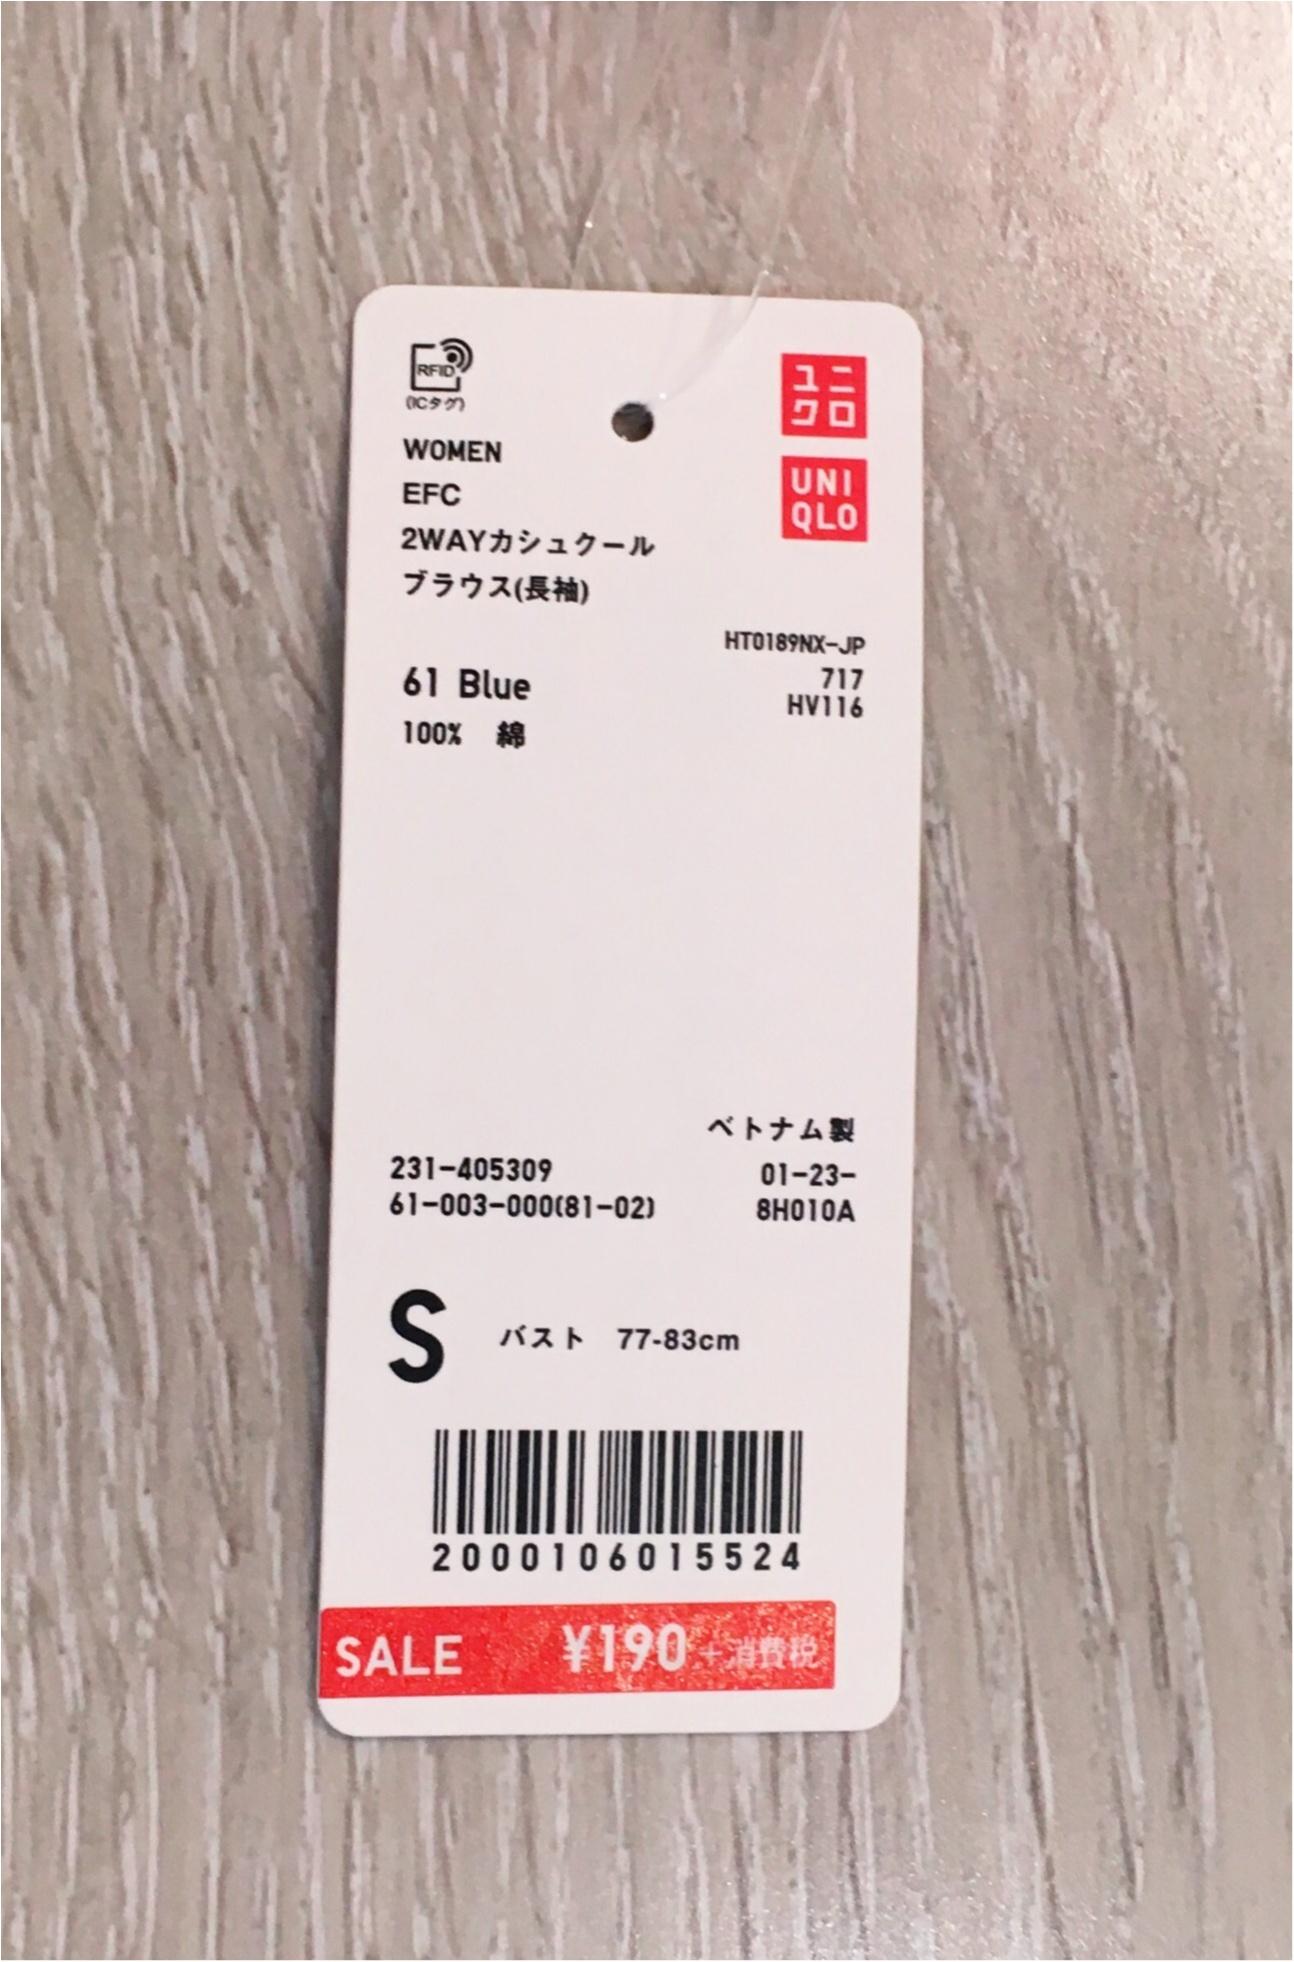 【UNIQLO】ドリンク代以下!?の、まさかのお値段に三度見!!?今季流行カシュクールブラウス!_3